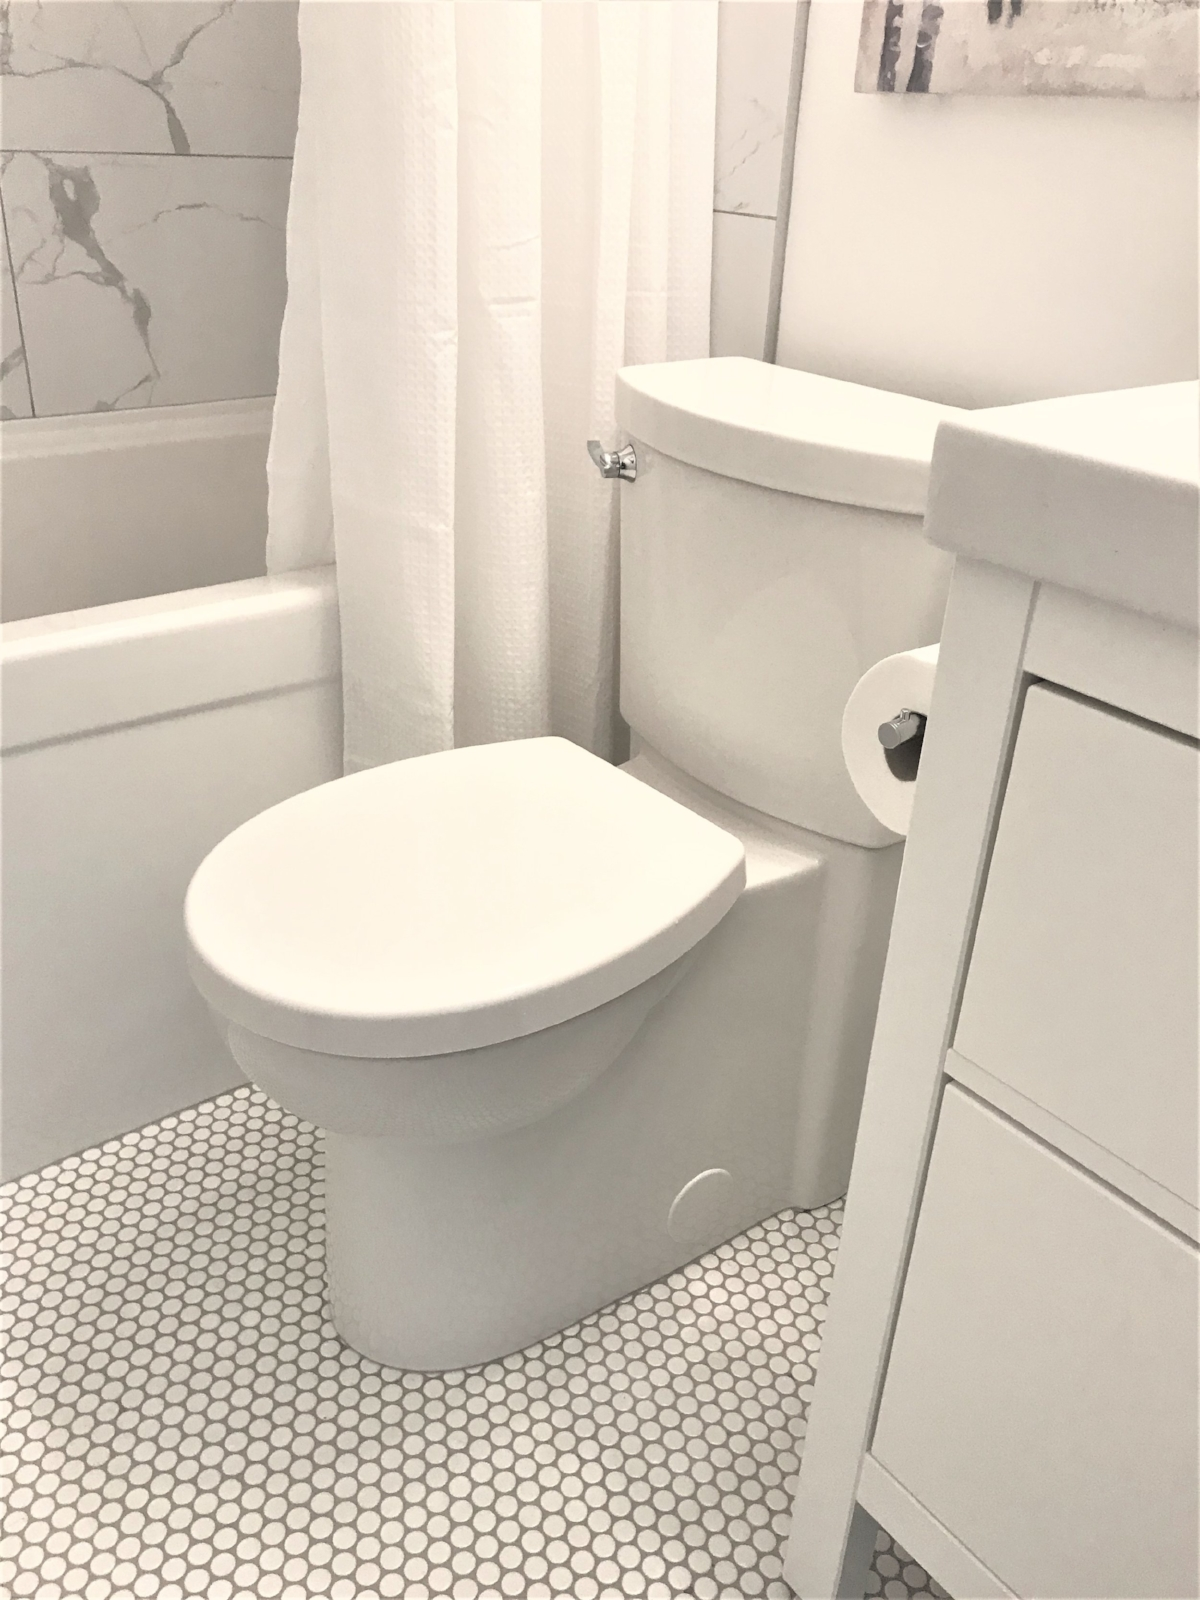 Calgary Interior Designer - Bathroom renovation - how to make a small bathroom appear larger